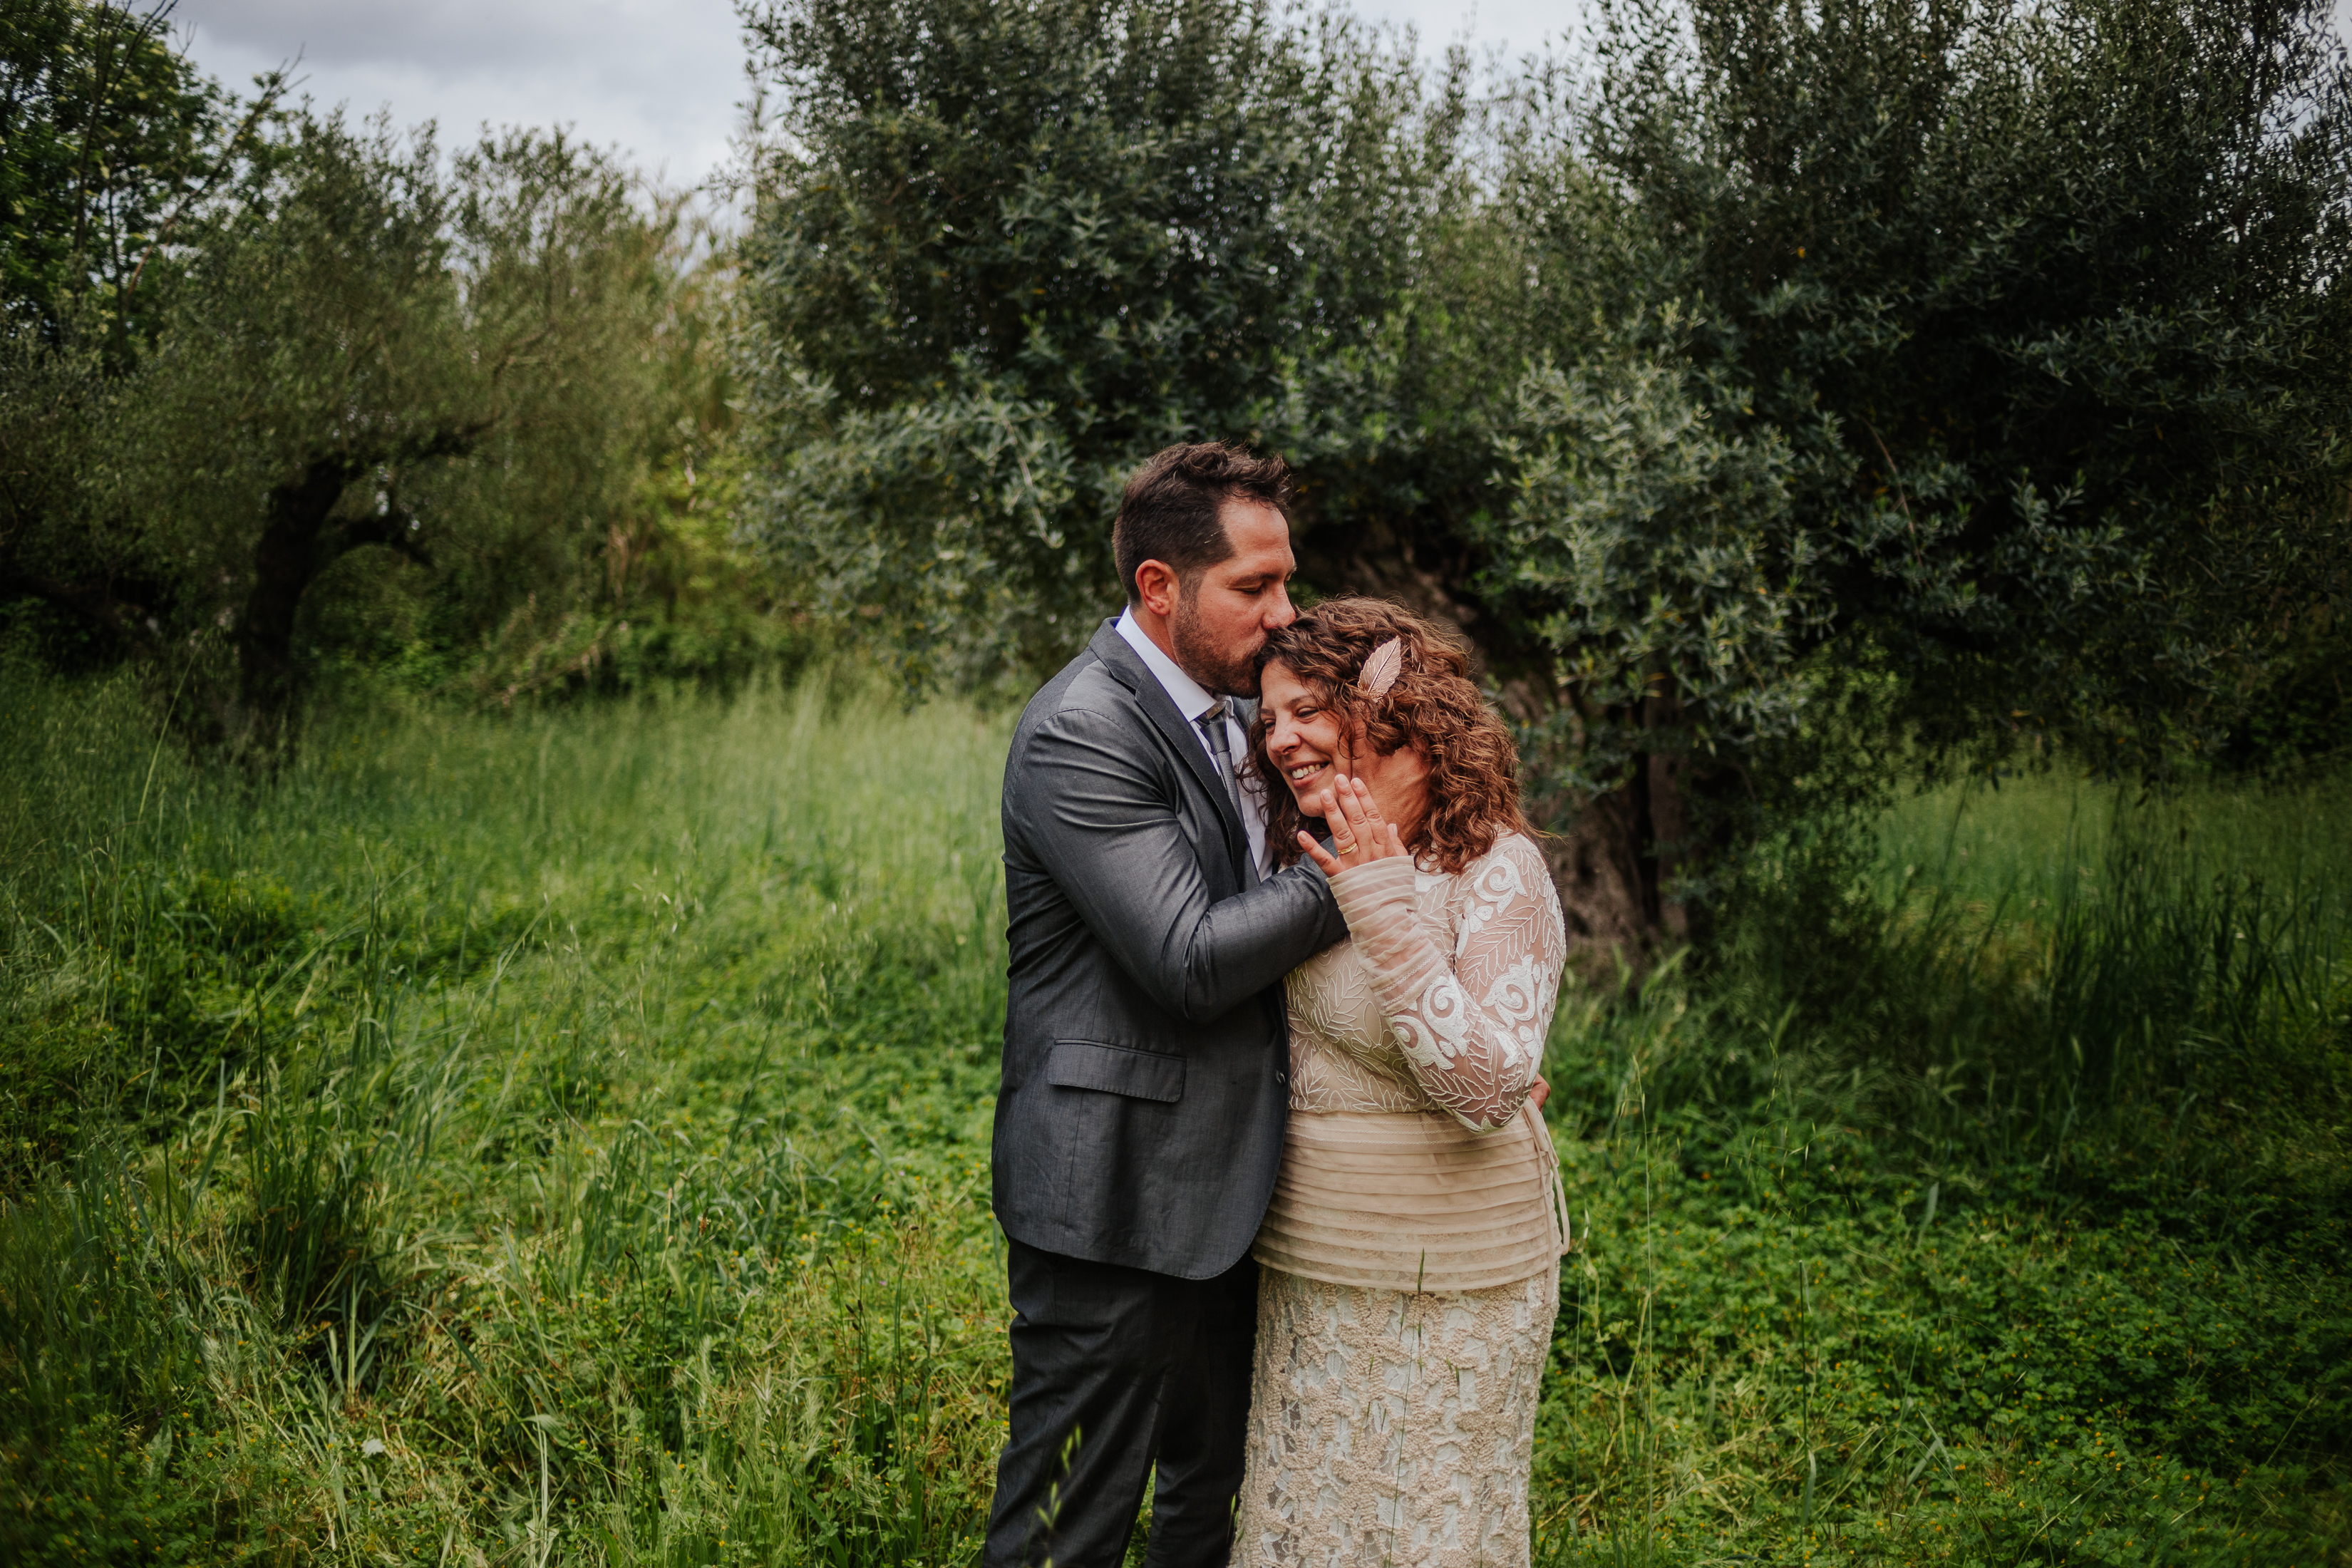 Fotógrafo boda Montseny :: Boda en el campo :: Boda en Montseny :: Boda informal :: Boda diferente :: Fotógrafo de boda Barcelona